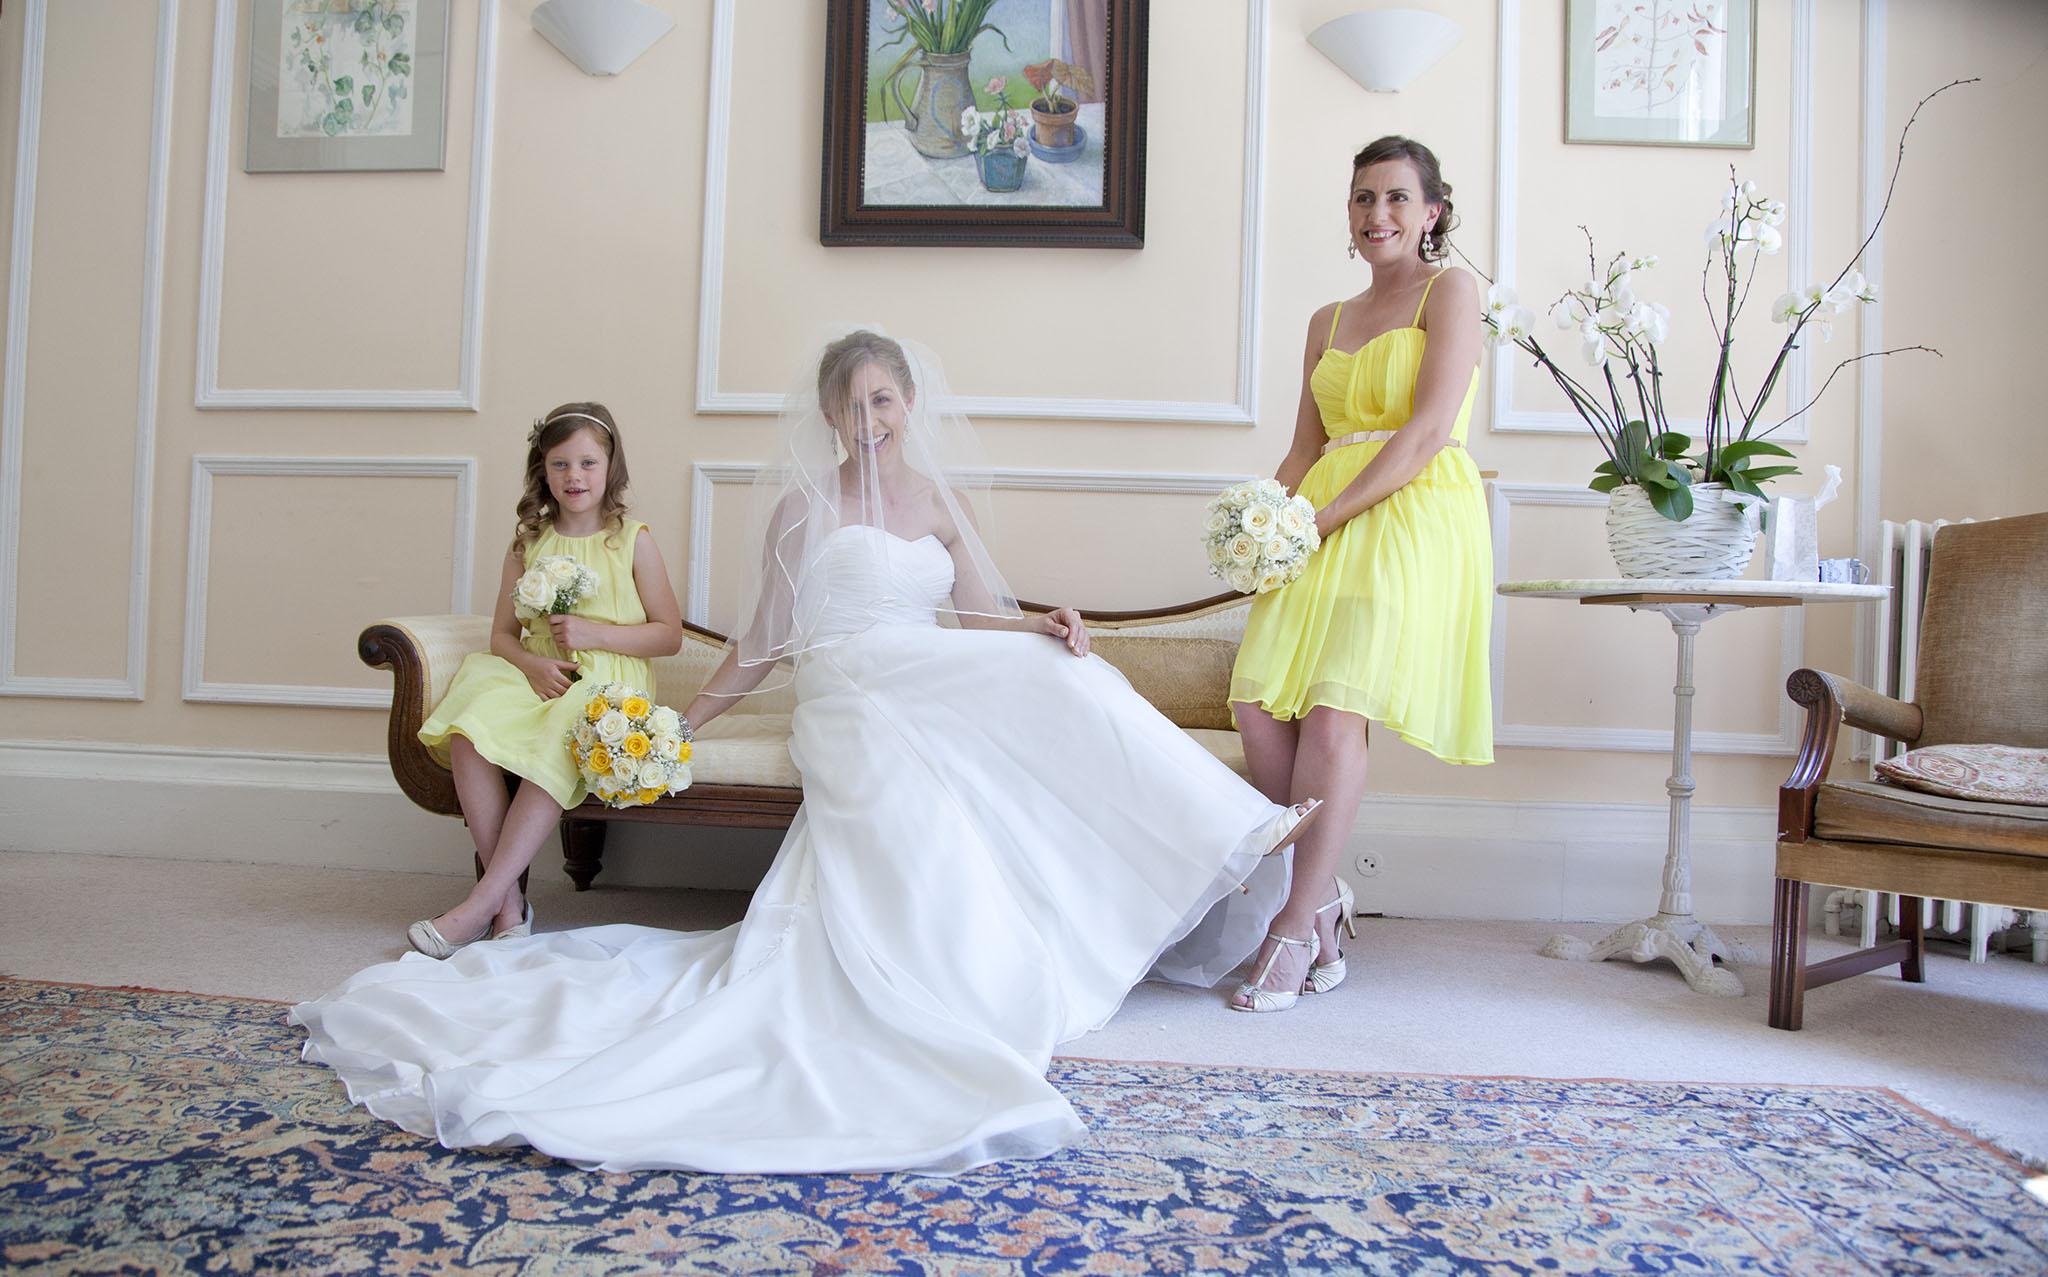 elizabethg_fineart_photography_hertfordshire_rachel_adam_wedding_highelmsmanor_16.jpg